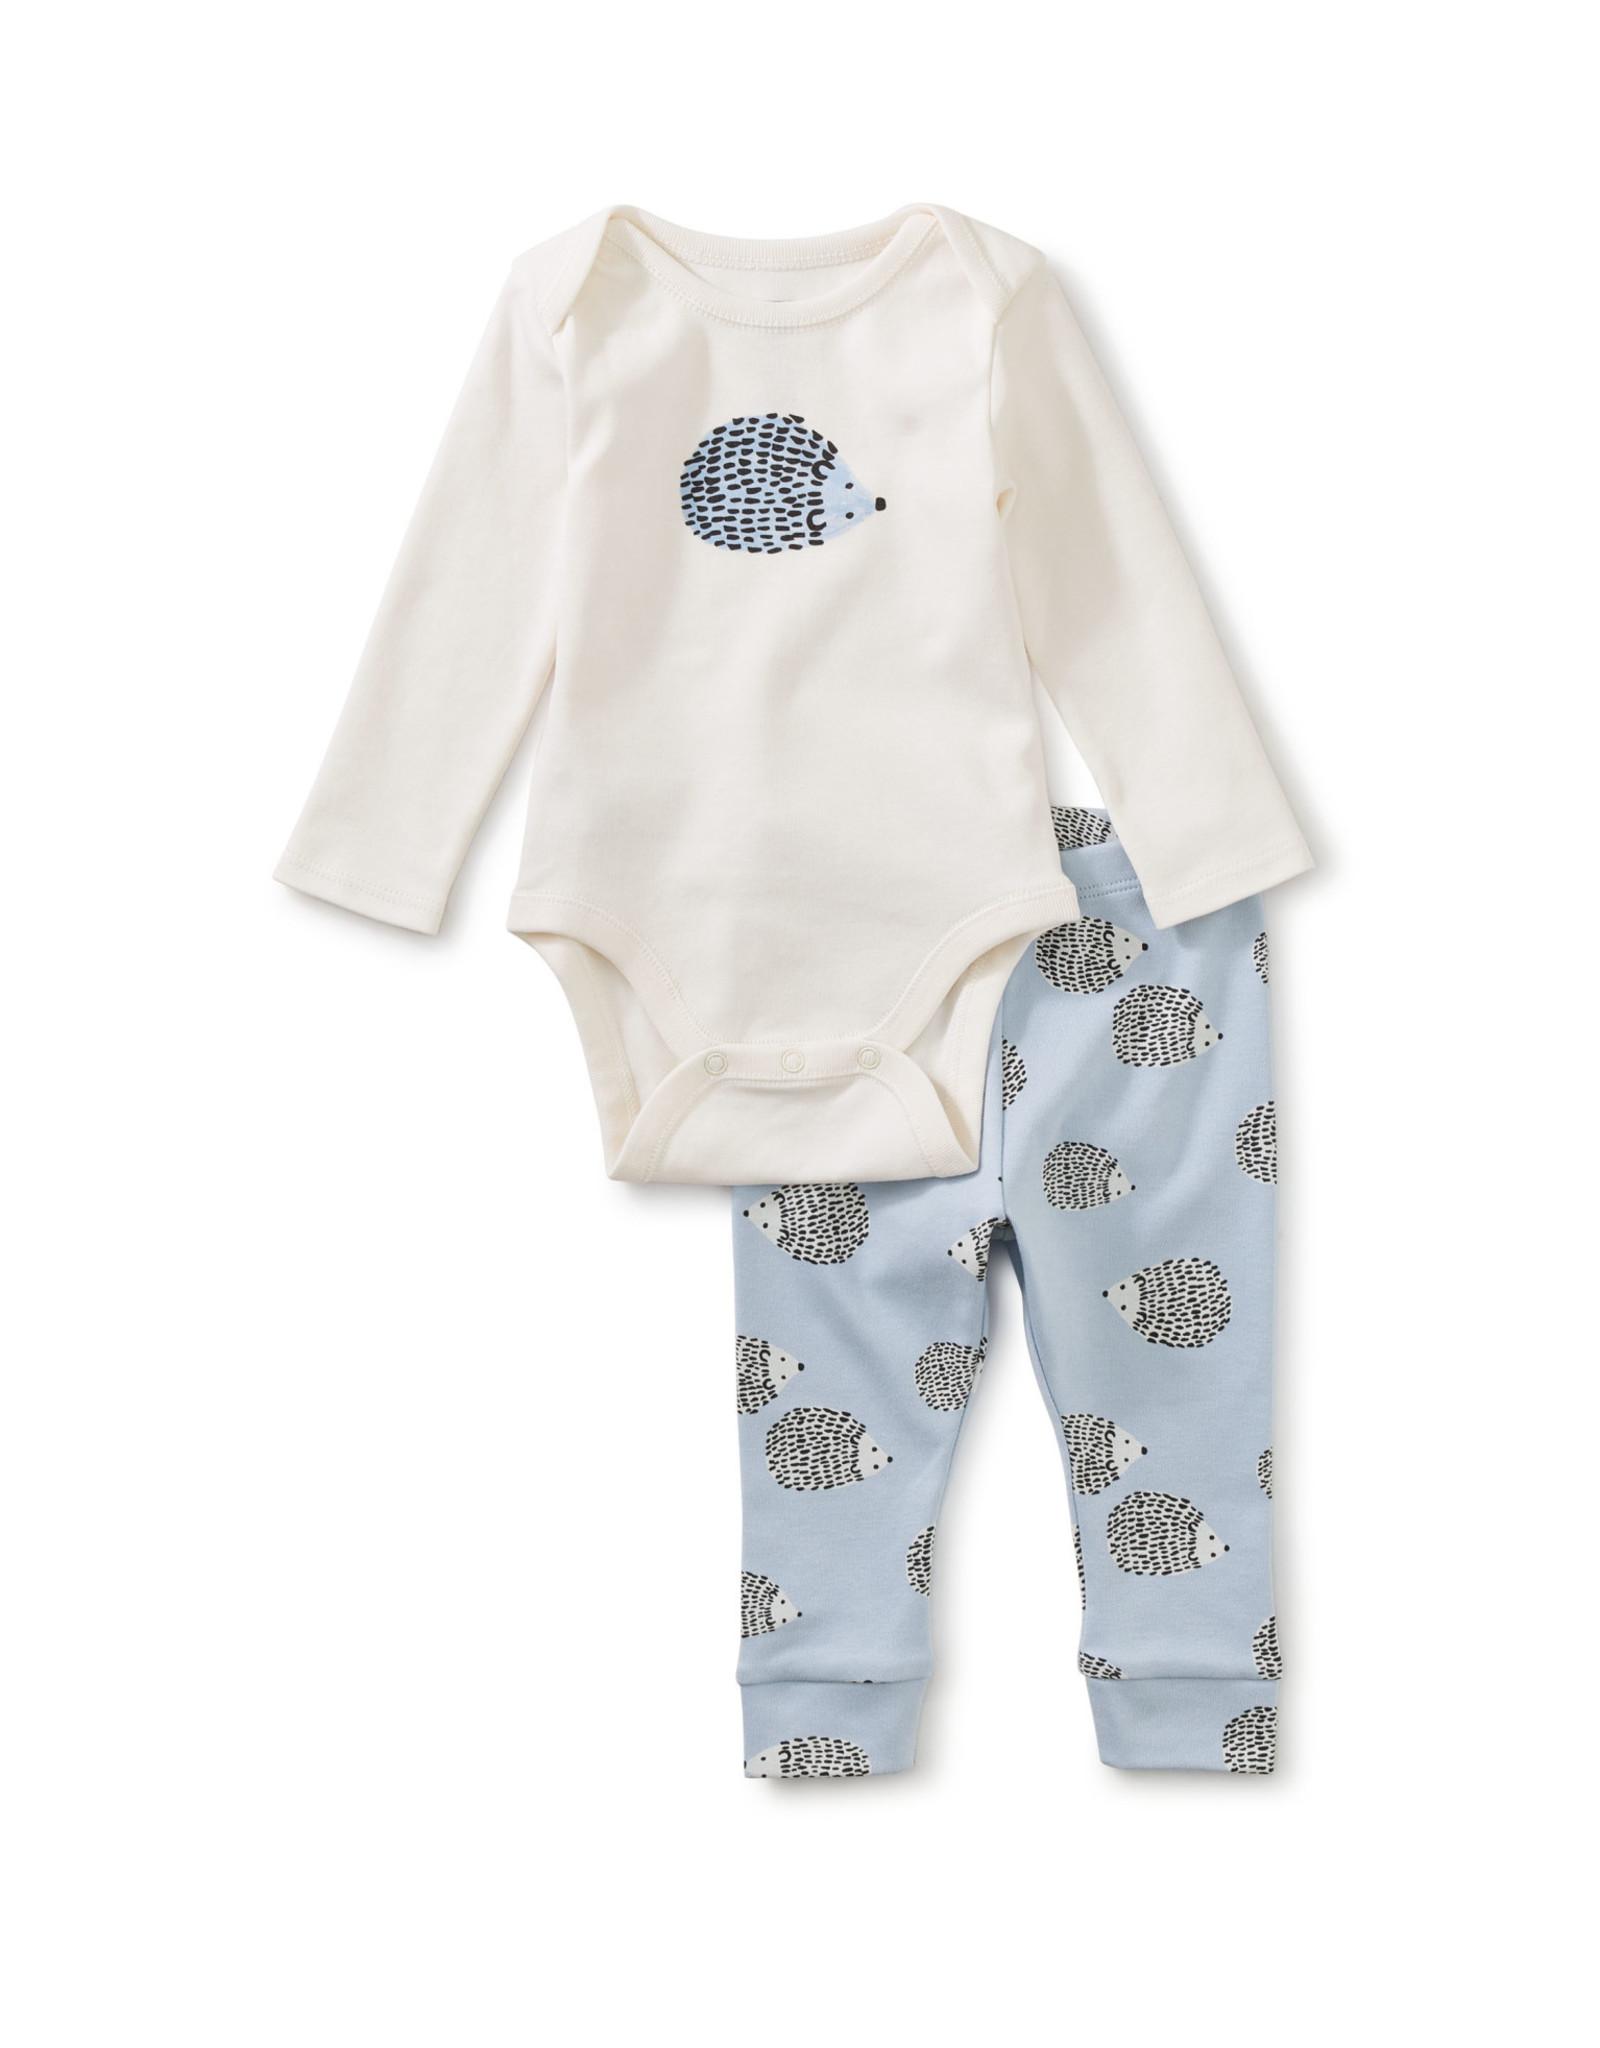 Tea Bodysuit Baby Outfit, Hedgehog